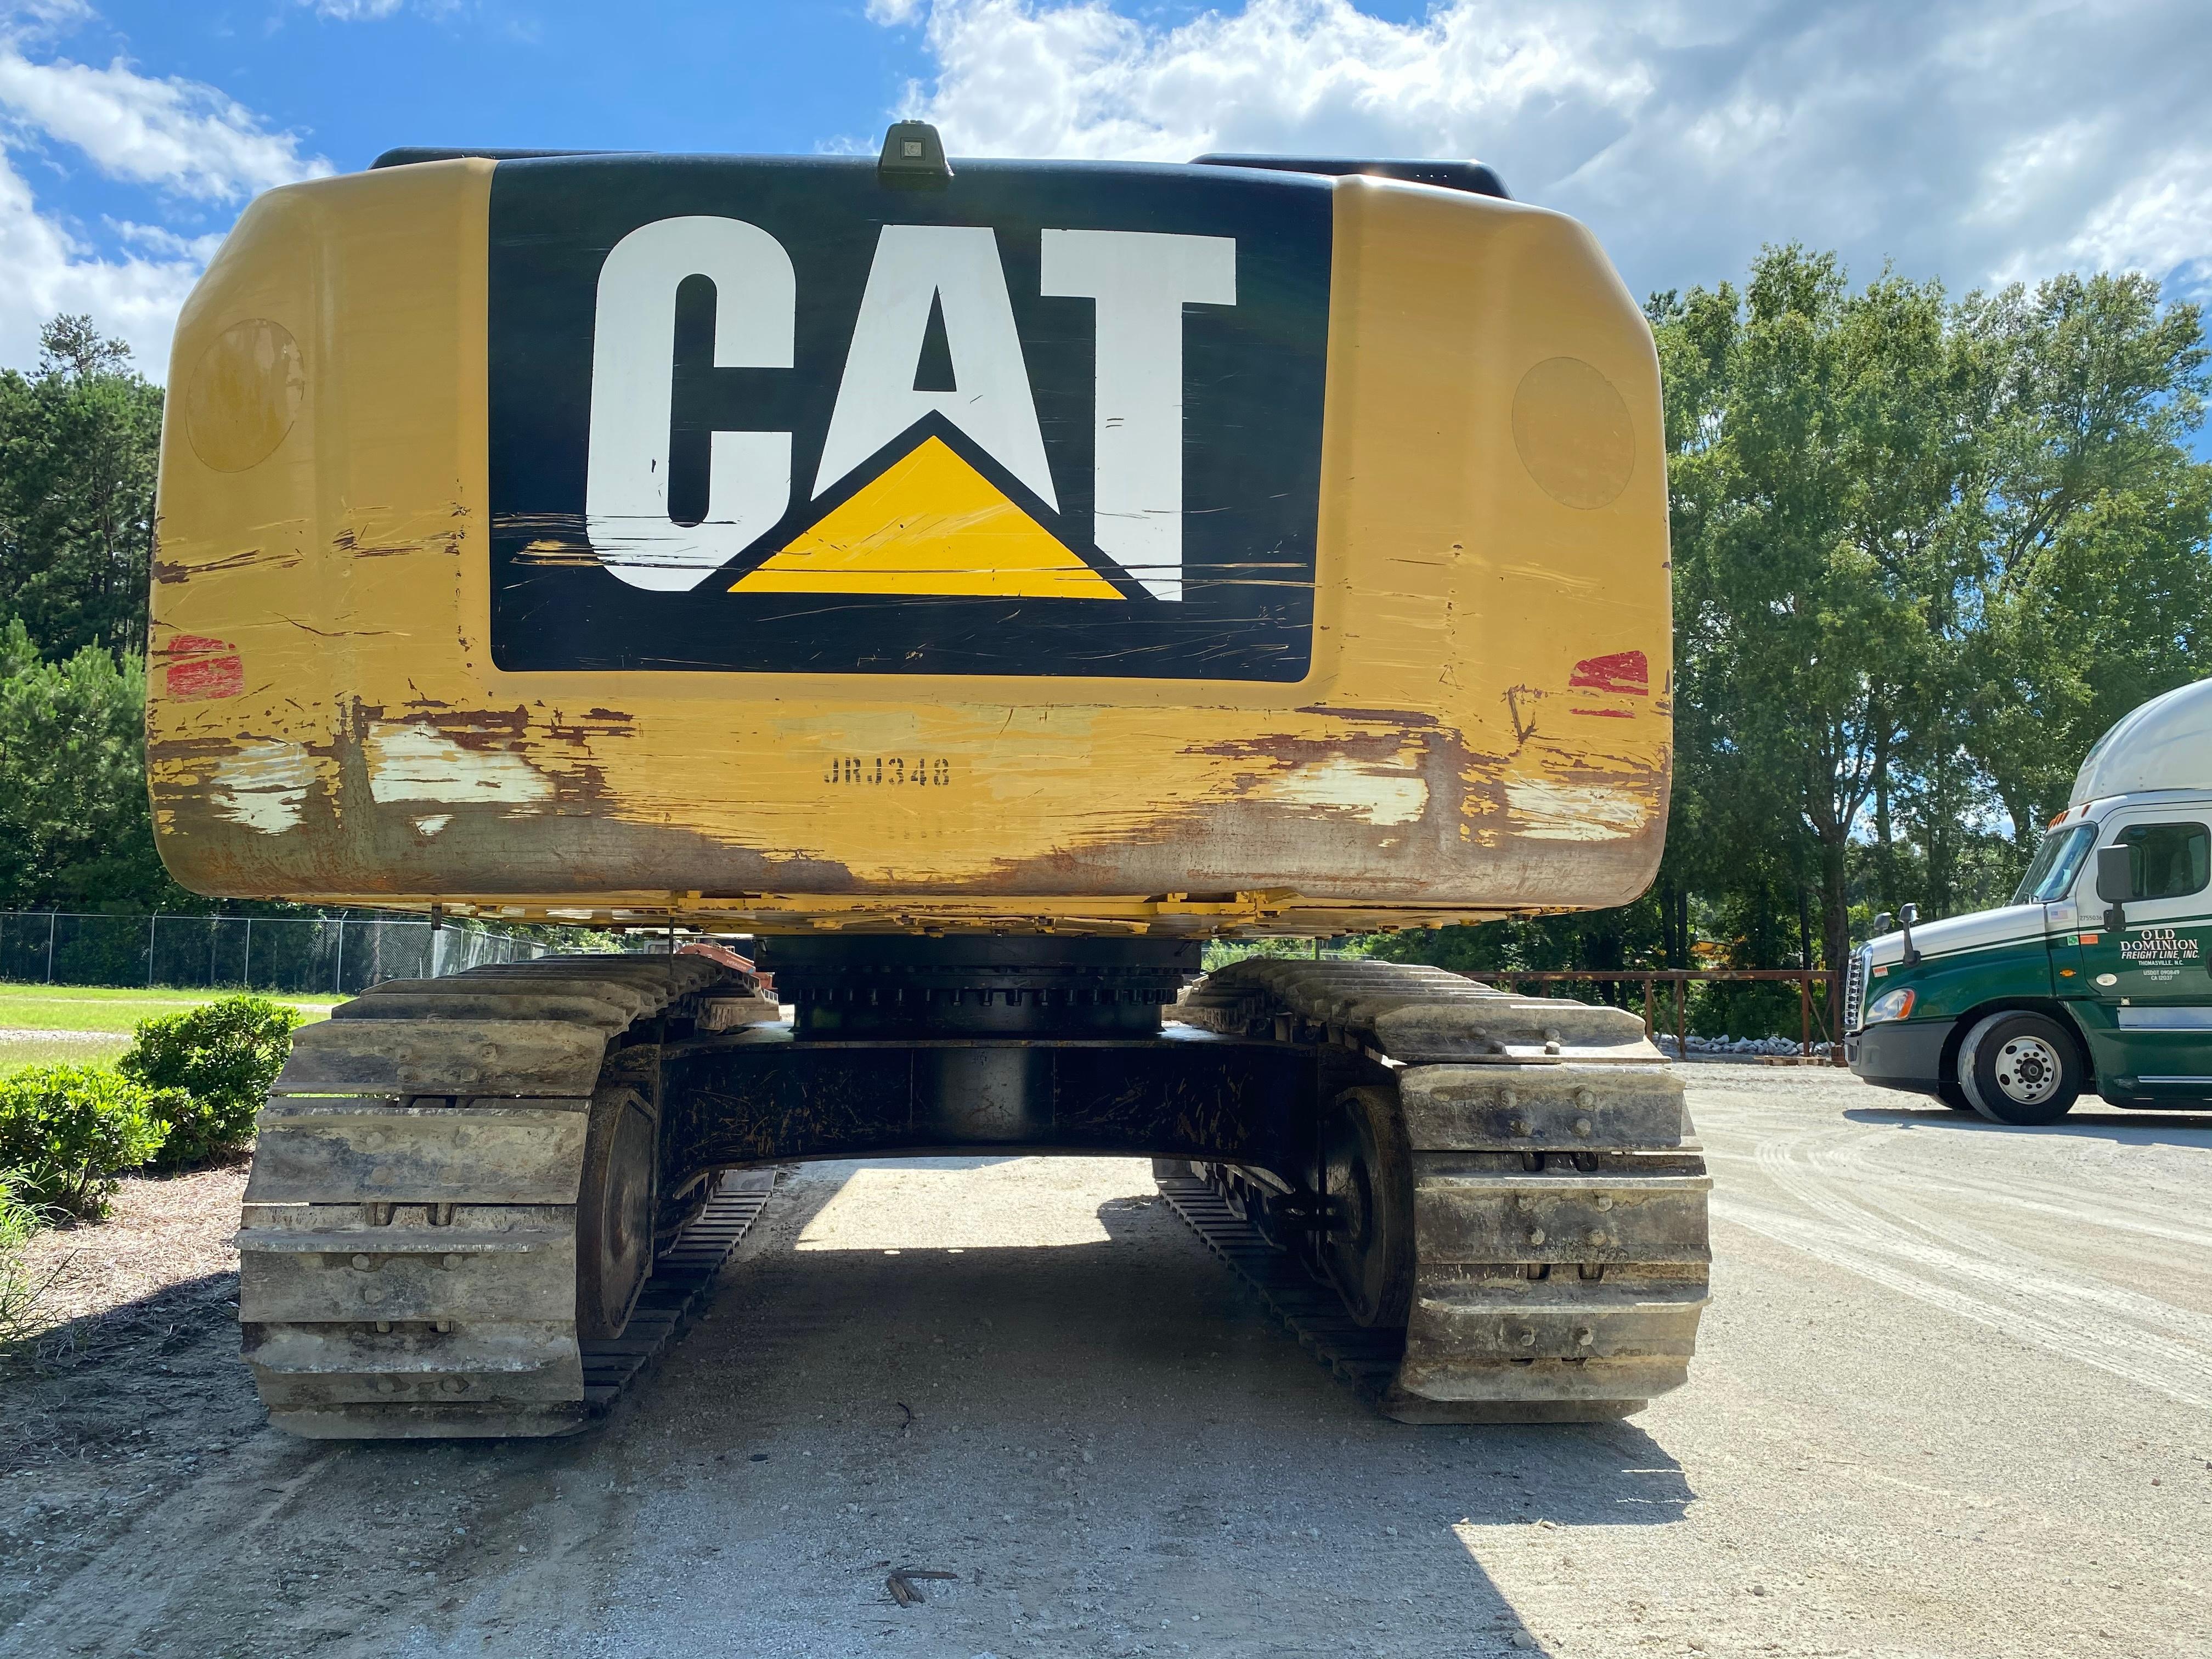 Used 2013 Caterpillar 336EL w/ Shear For Sale